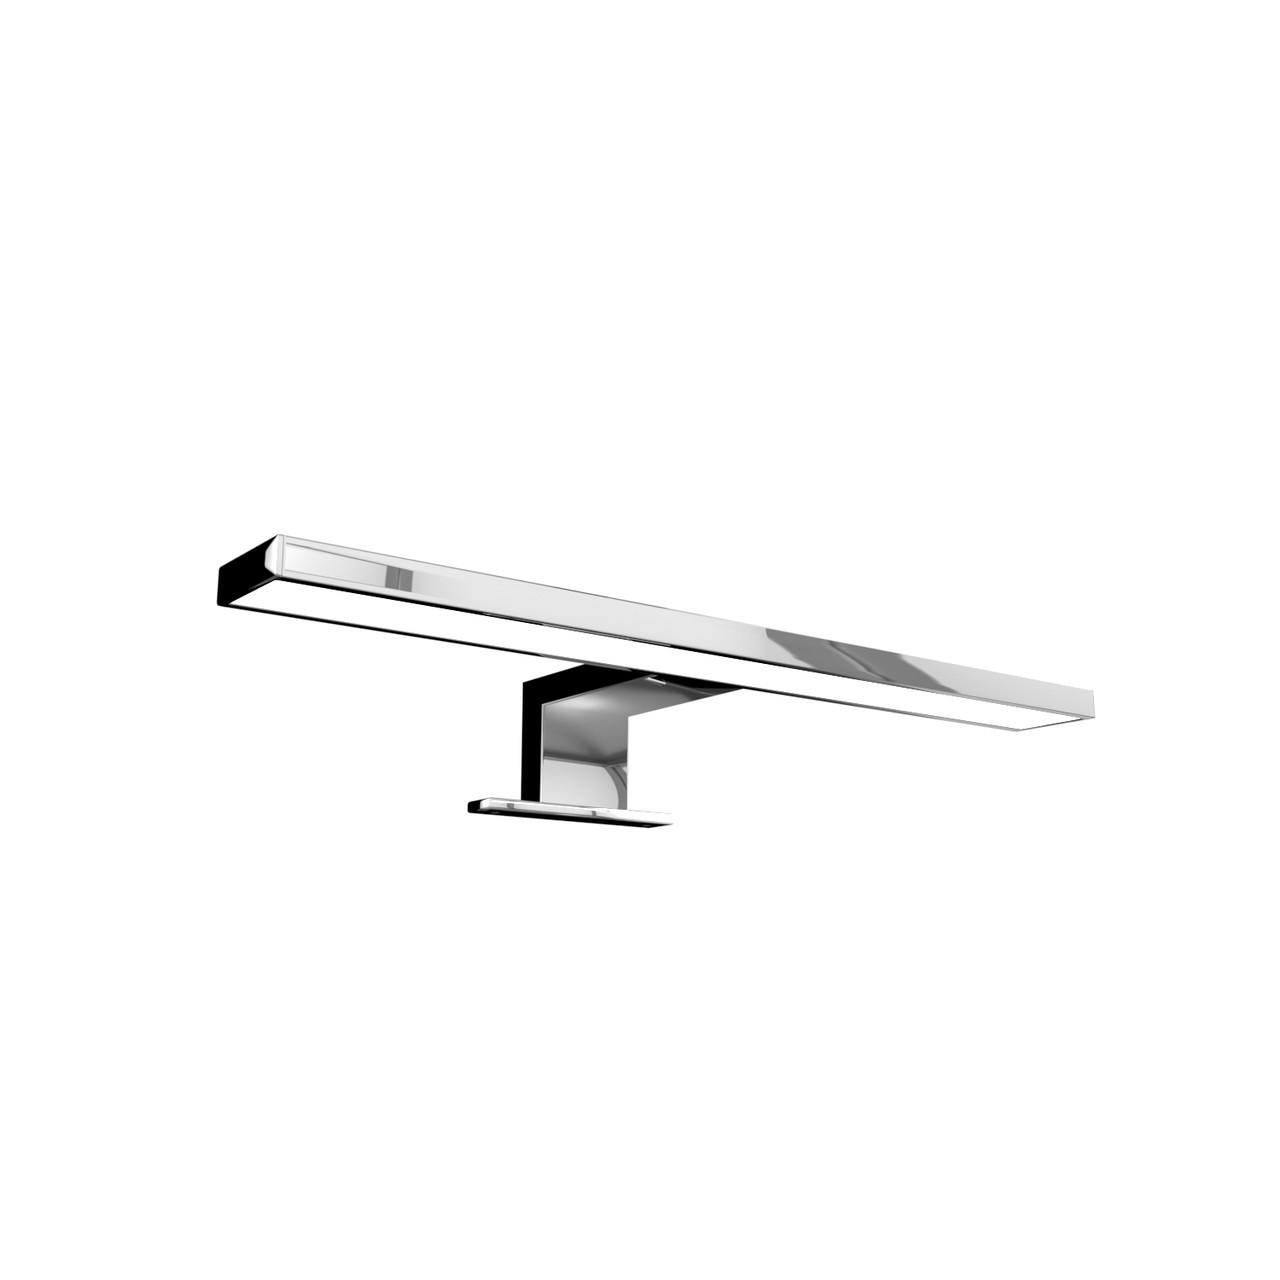 Светильник LED для ванной Sanwerk «SMART» PL 30 см